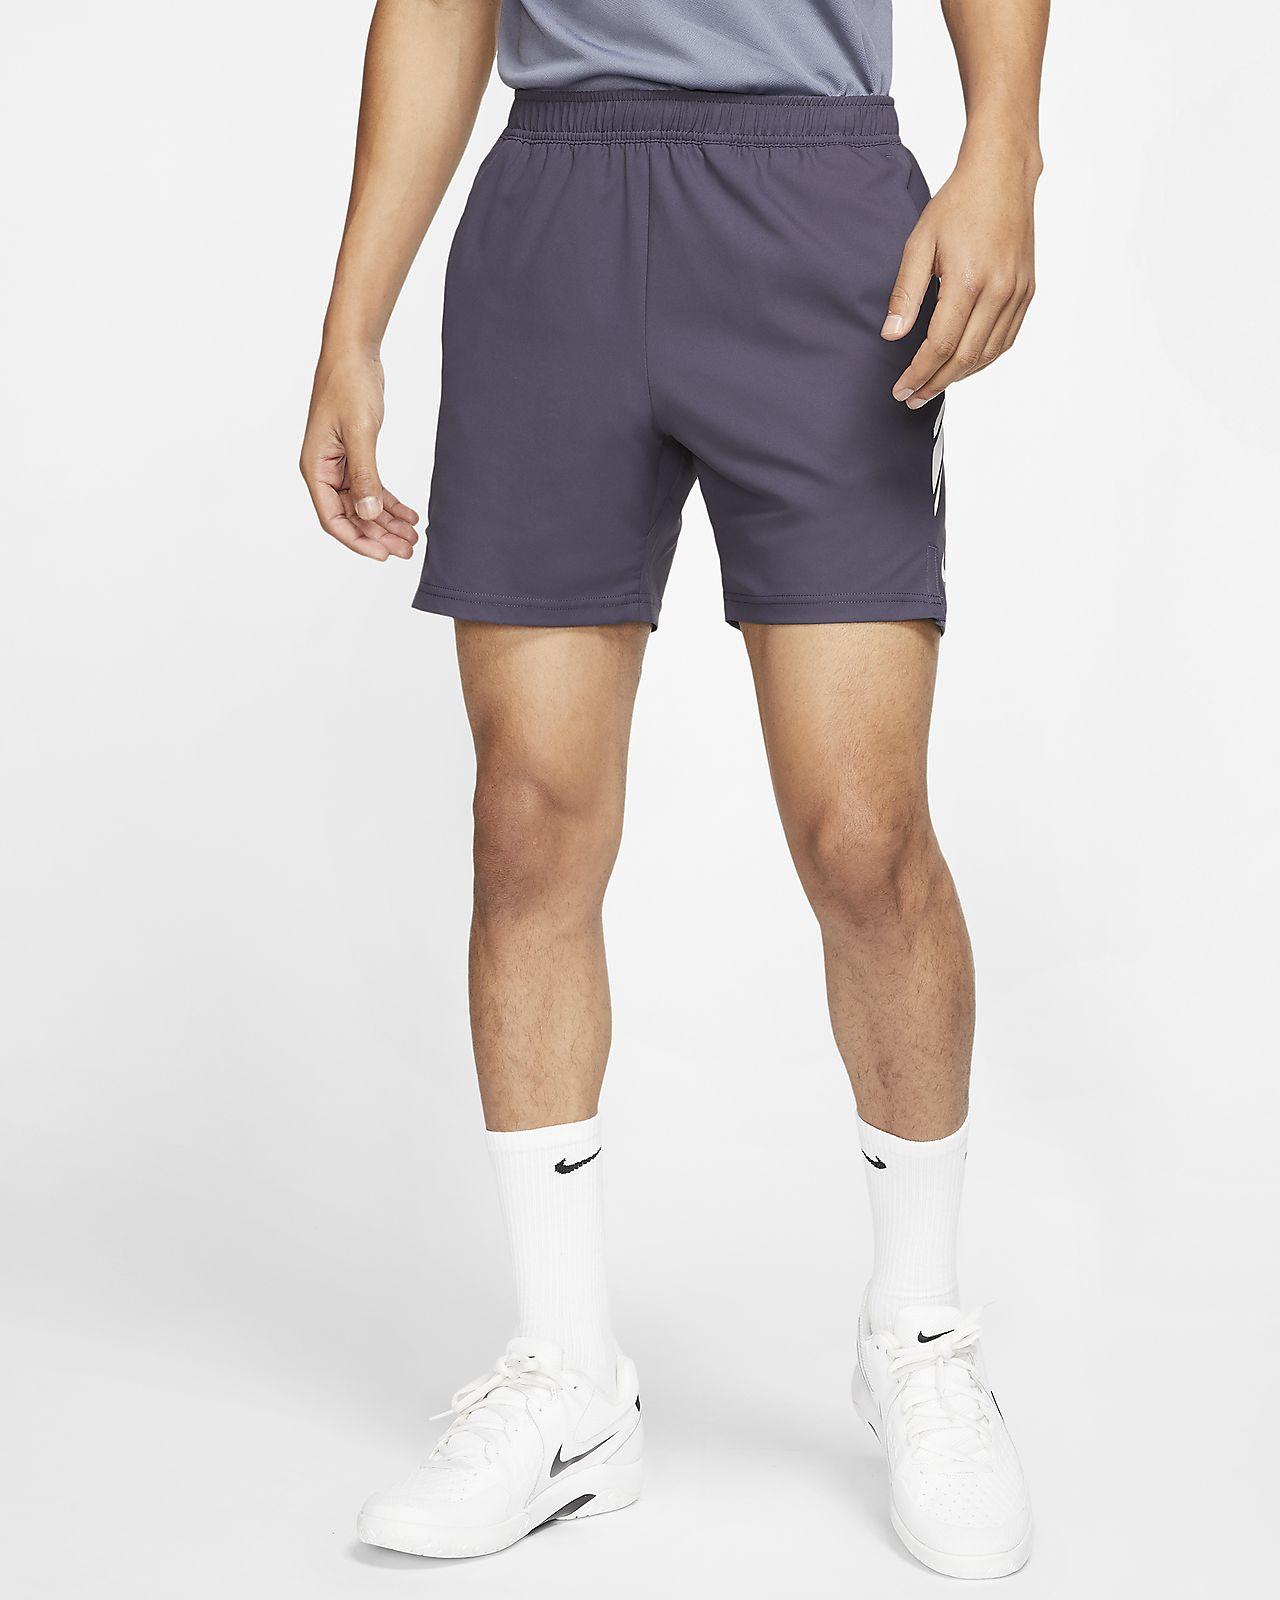 NikeCourt Dri-FIT Men's 18cm approx. Tennis Shorts